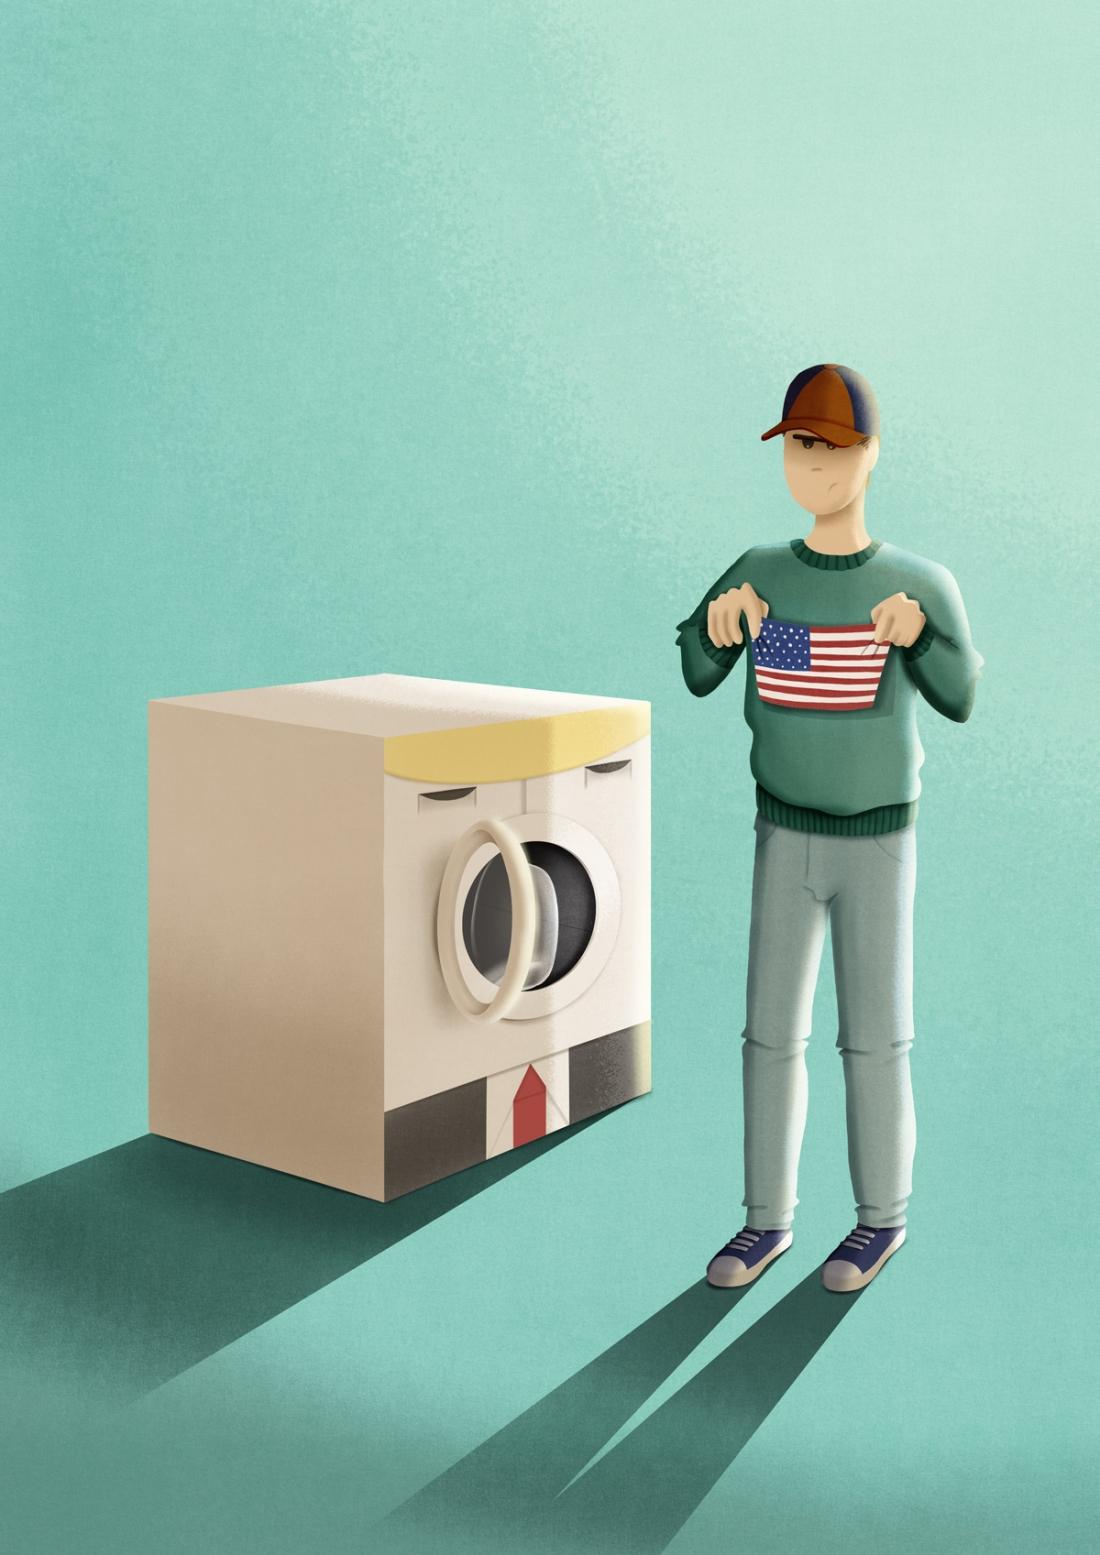 """Make America small again"" - Personal project."